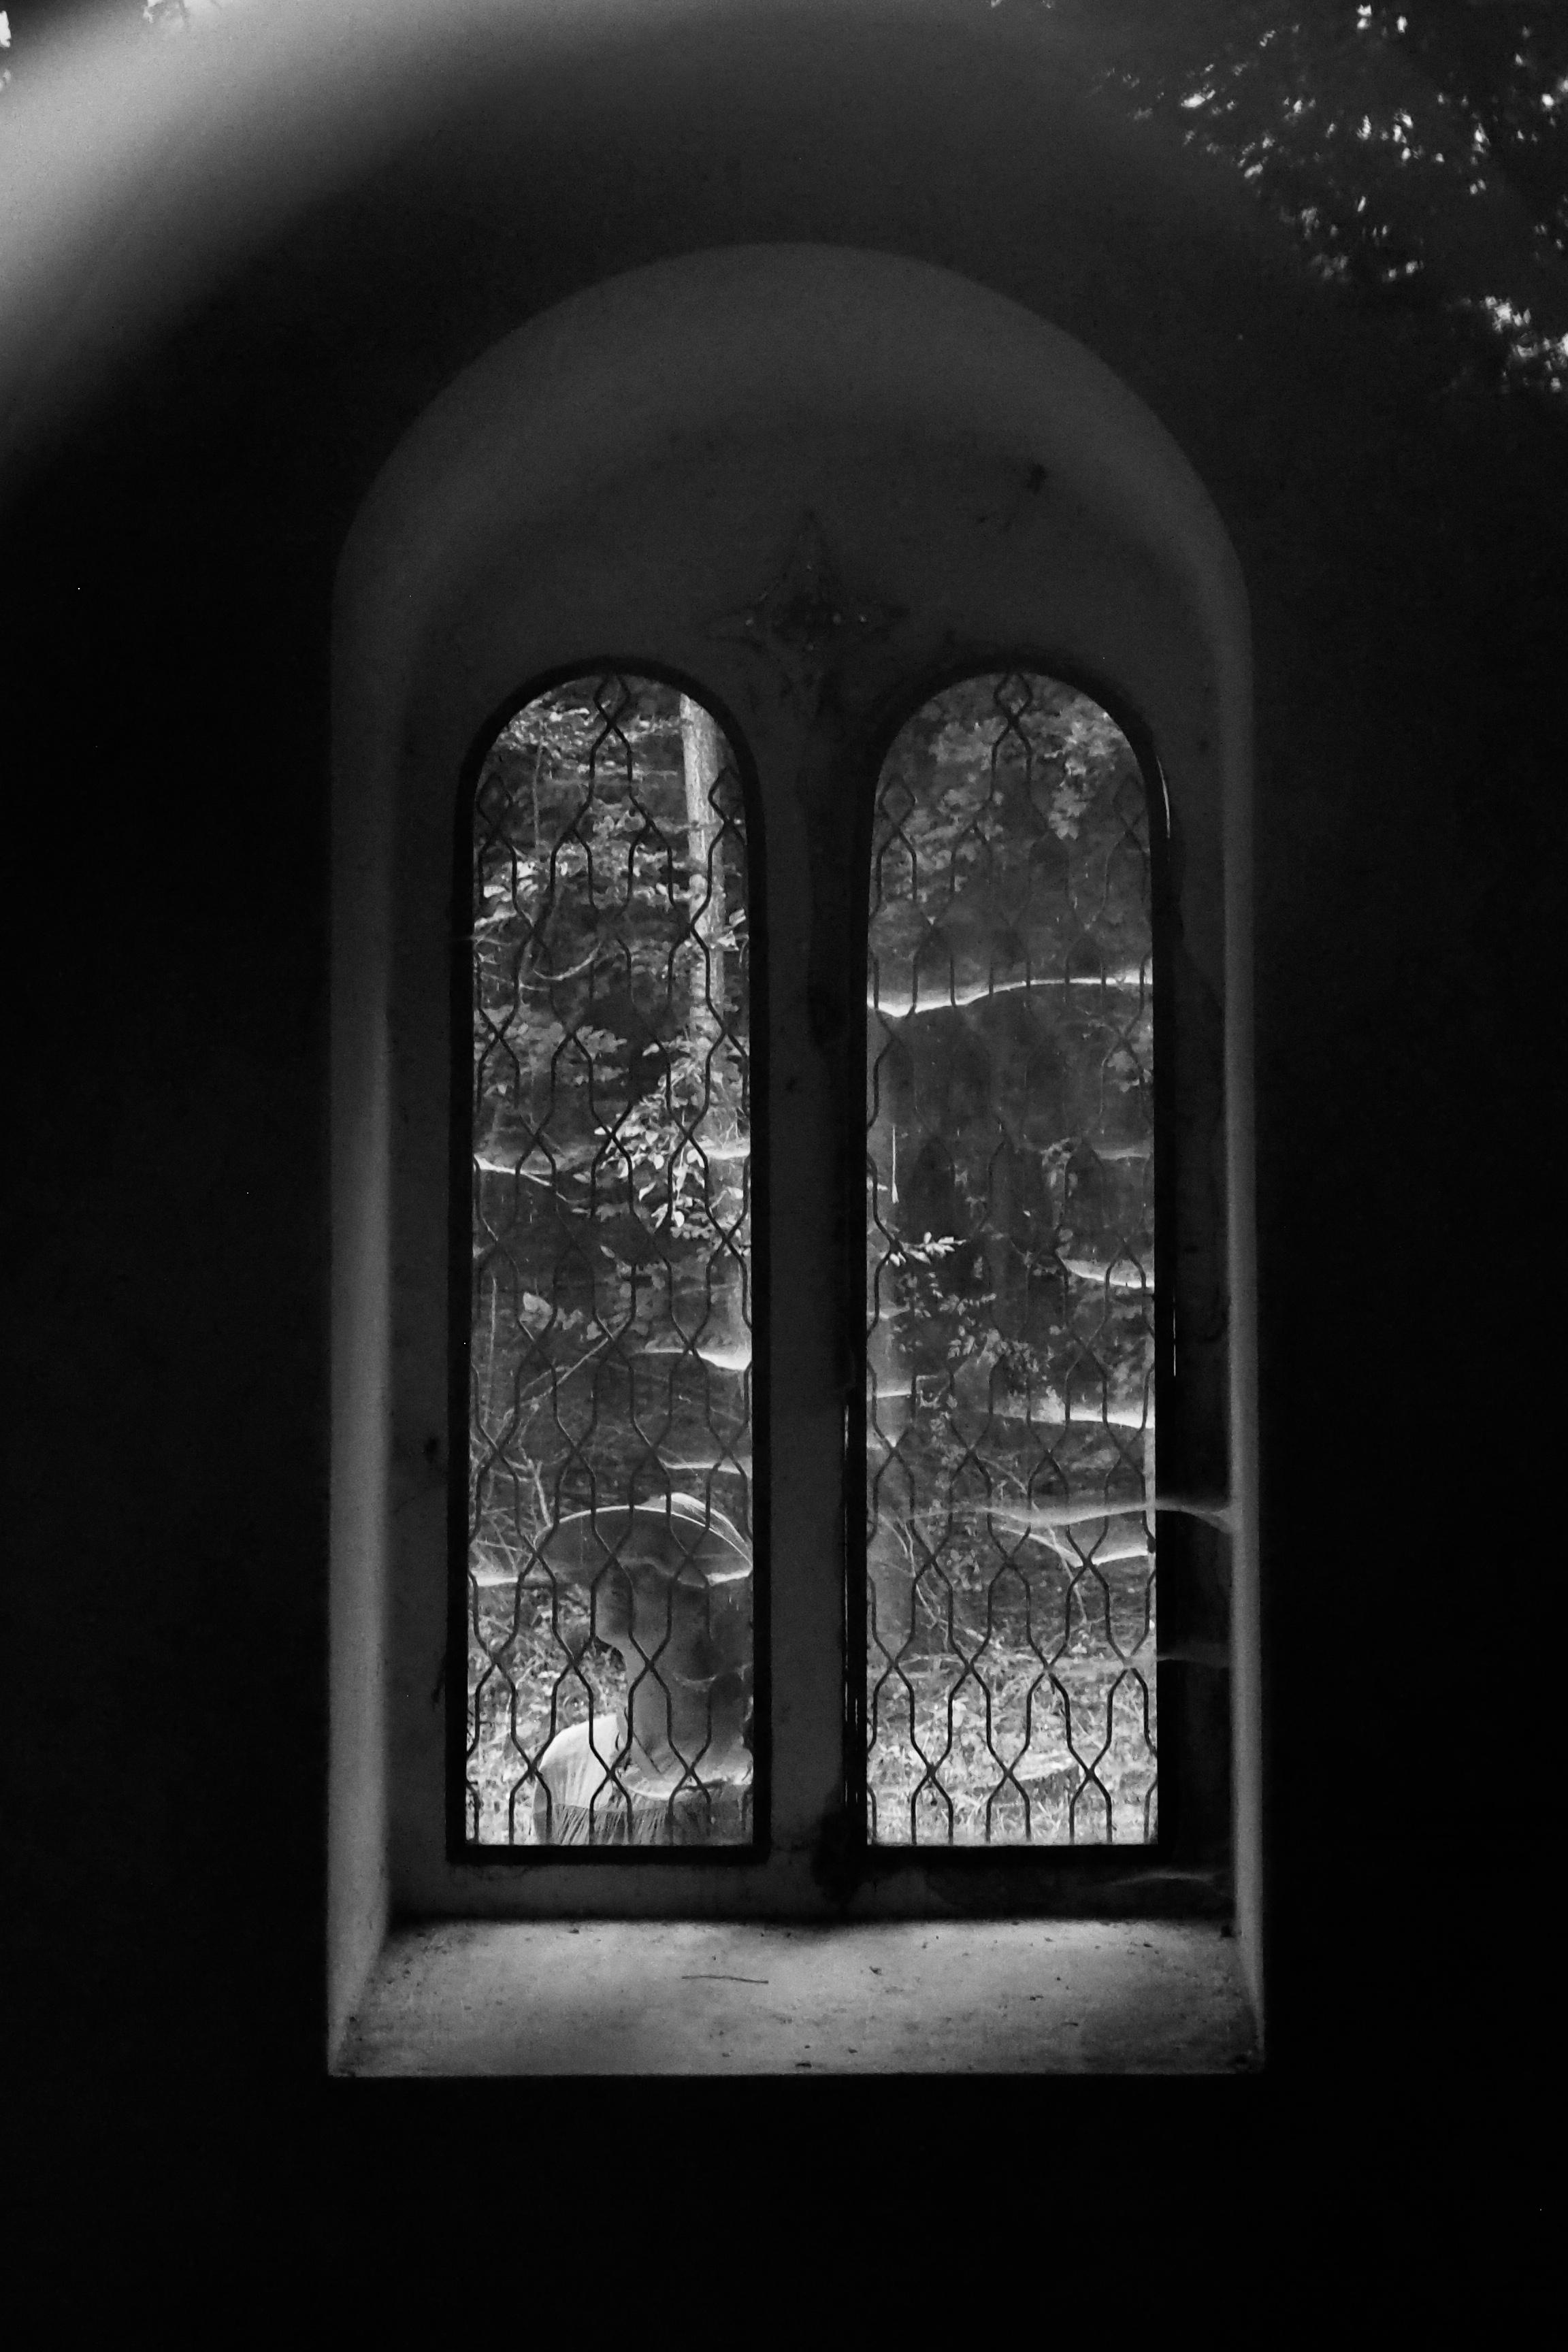 Dáma za oknom